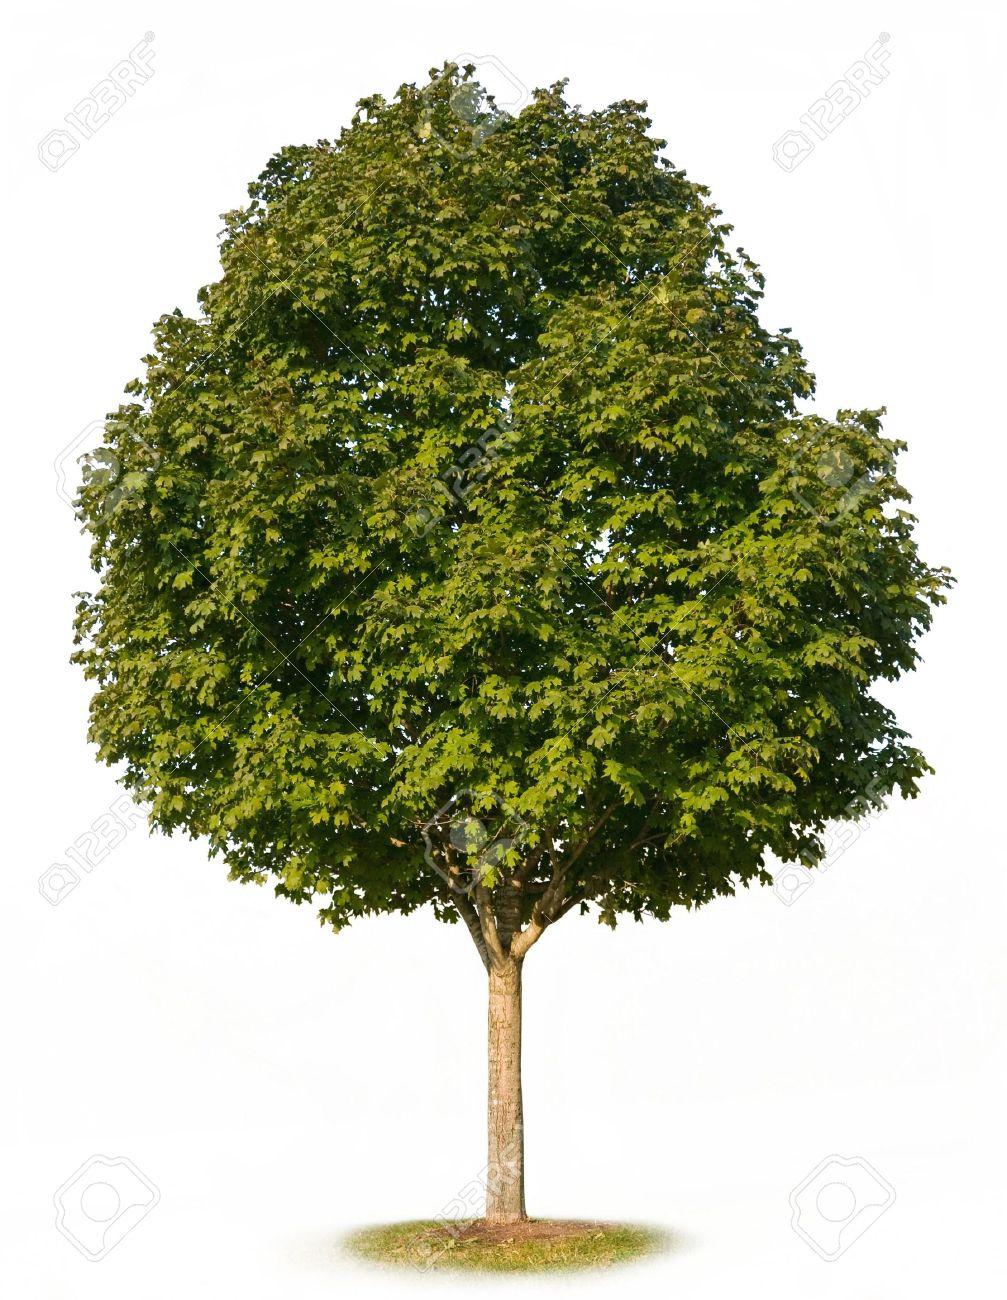 Sugar Maple Tree Acer Saccharum Isolated On White Background